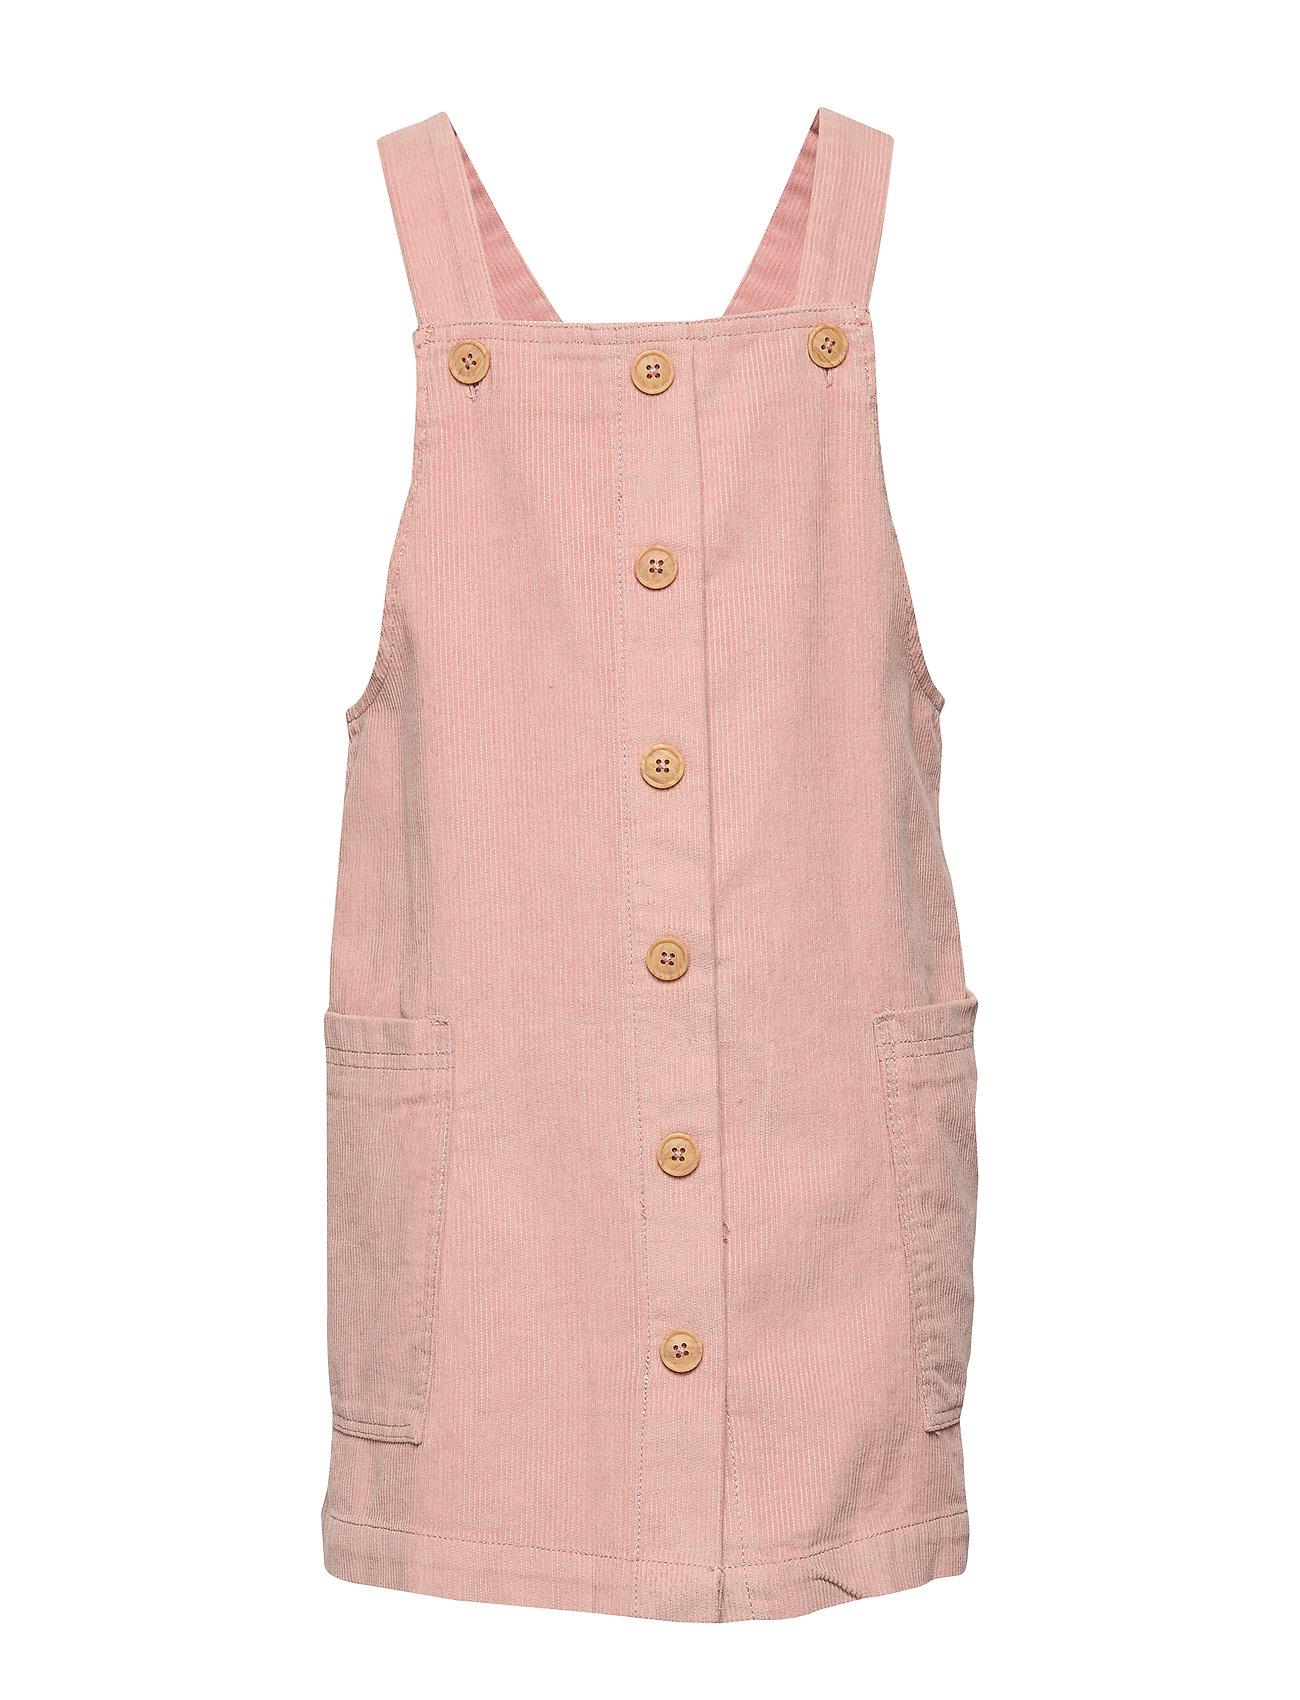 Mango Kids Buttons corduroy pinafore dress - PINK